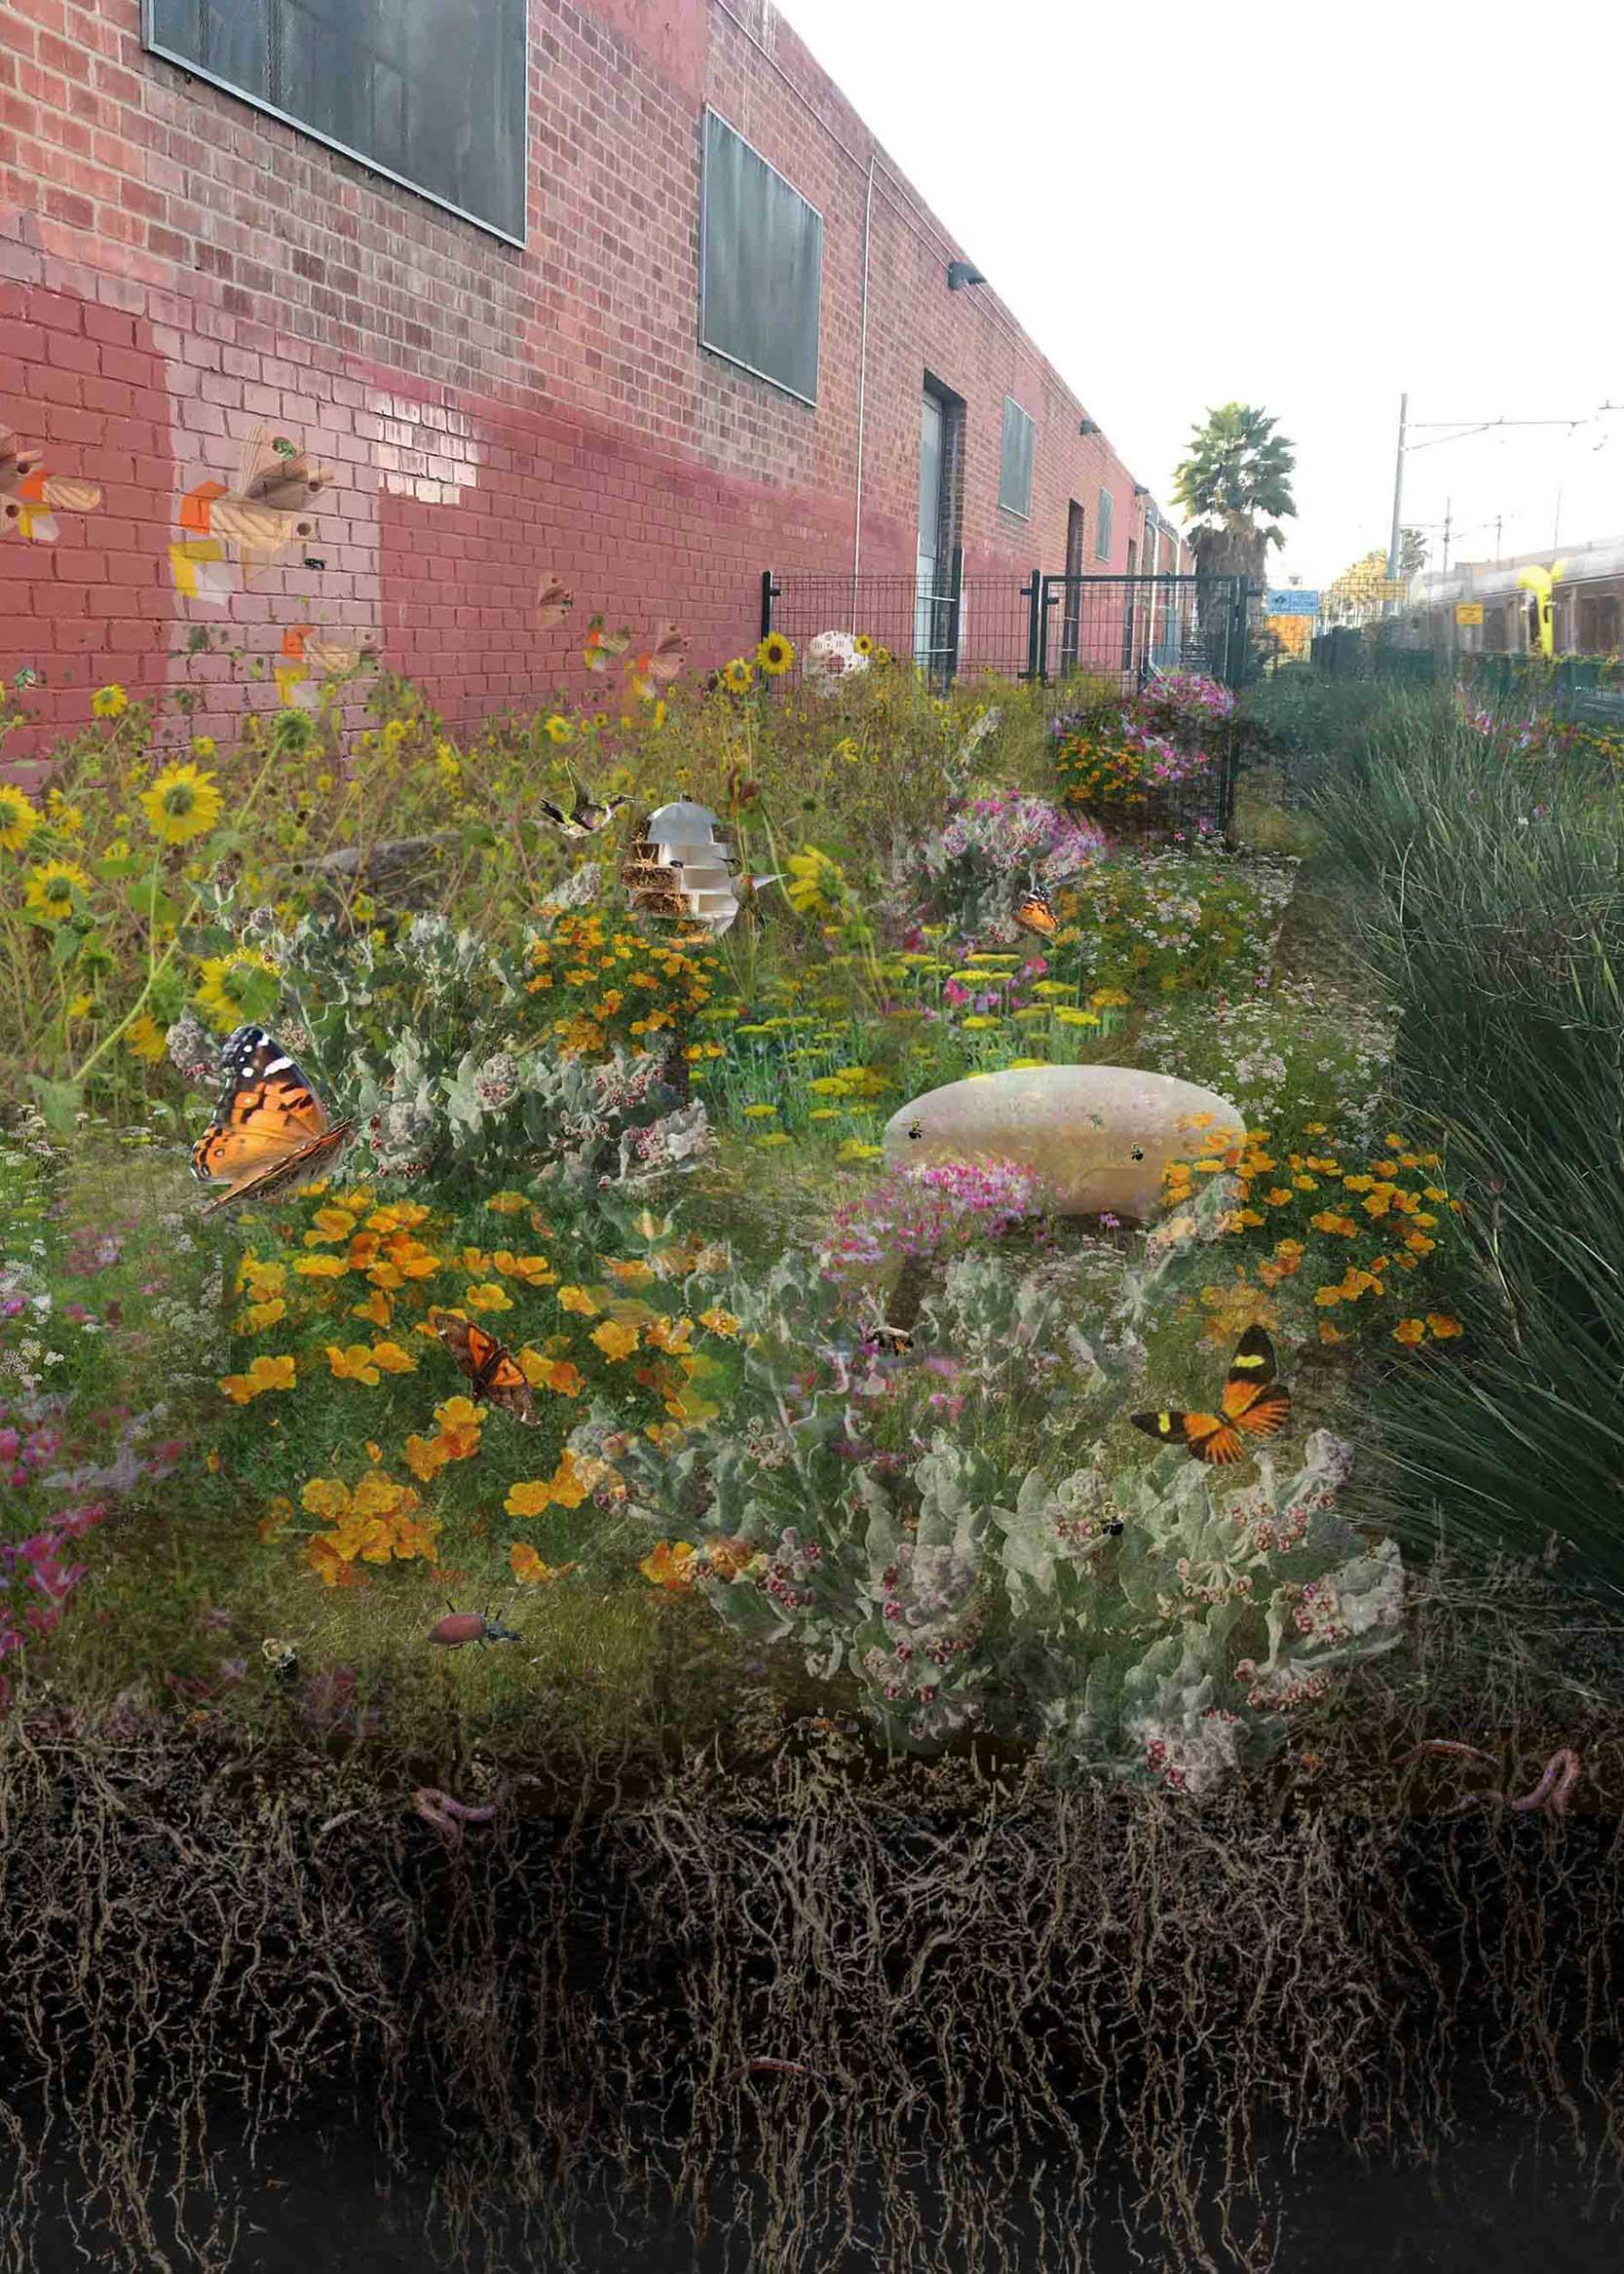 butterflies and flowers in urban backyard